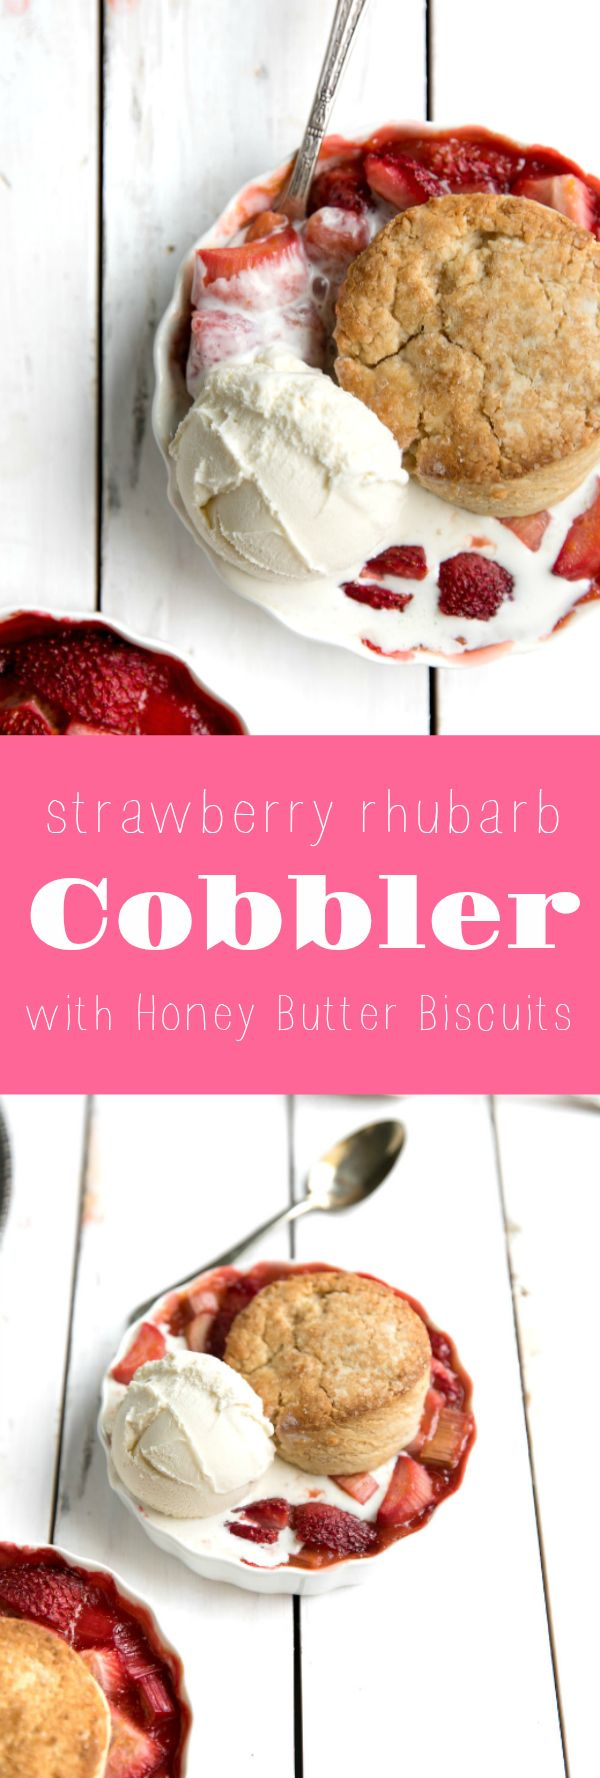 Strawberry Rhubarb Cobbler with Honey Butter Biscuits via @theforkedspoon #dessert #cobbler #rhubarb #pie #strawberry #theforkedspoon via @theforkedspoon